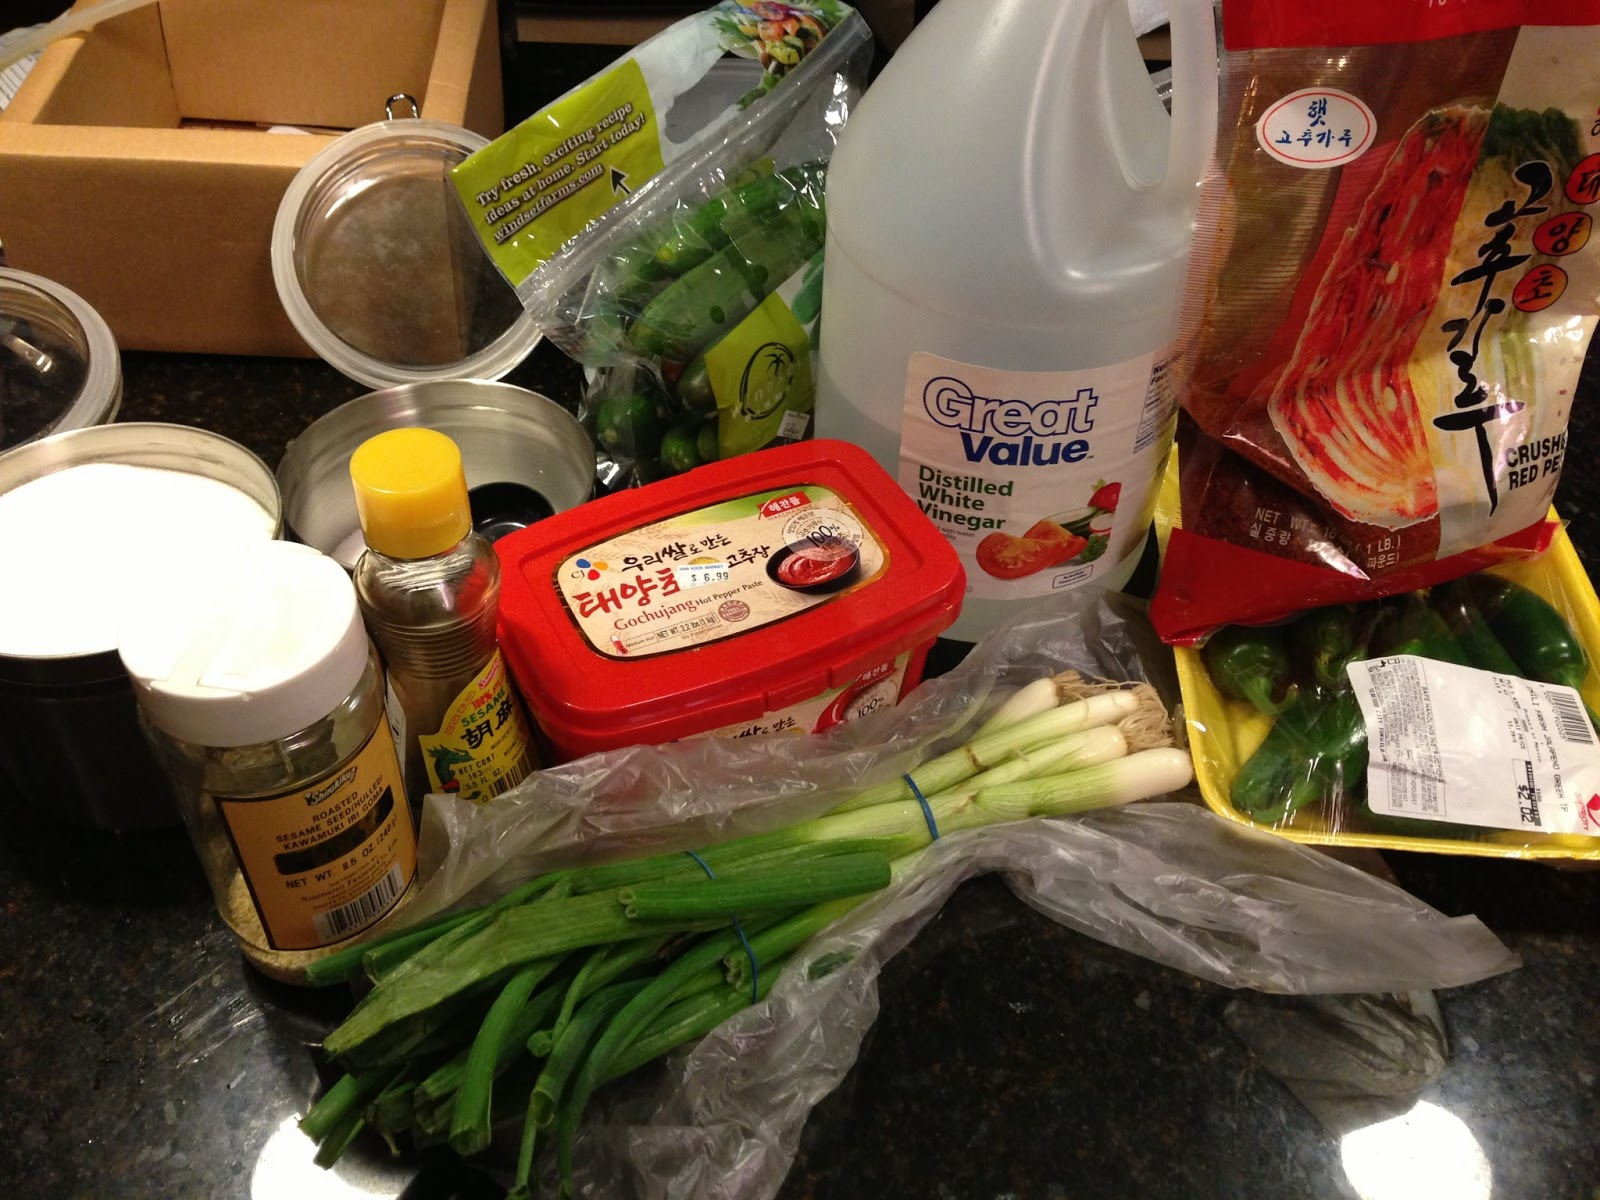 Korean cucumber salad ingredients